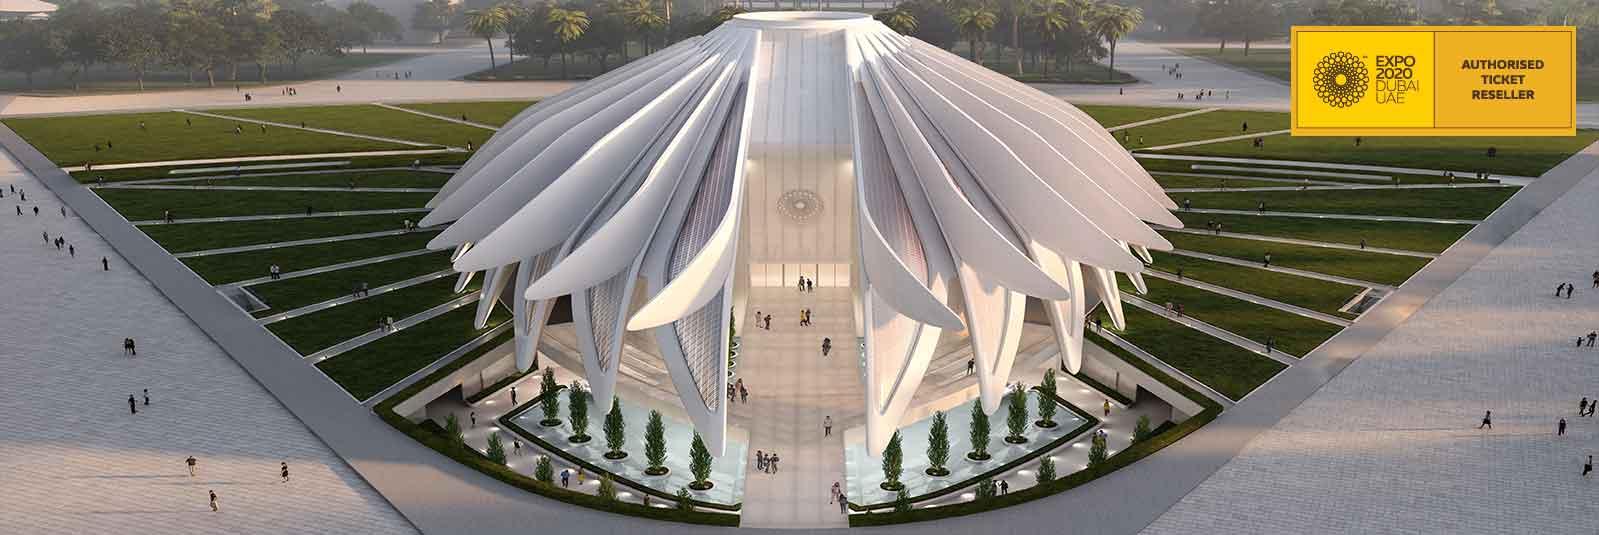 Dubai-Expo-2020-Ticket